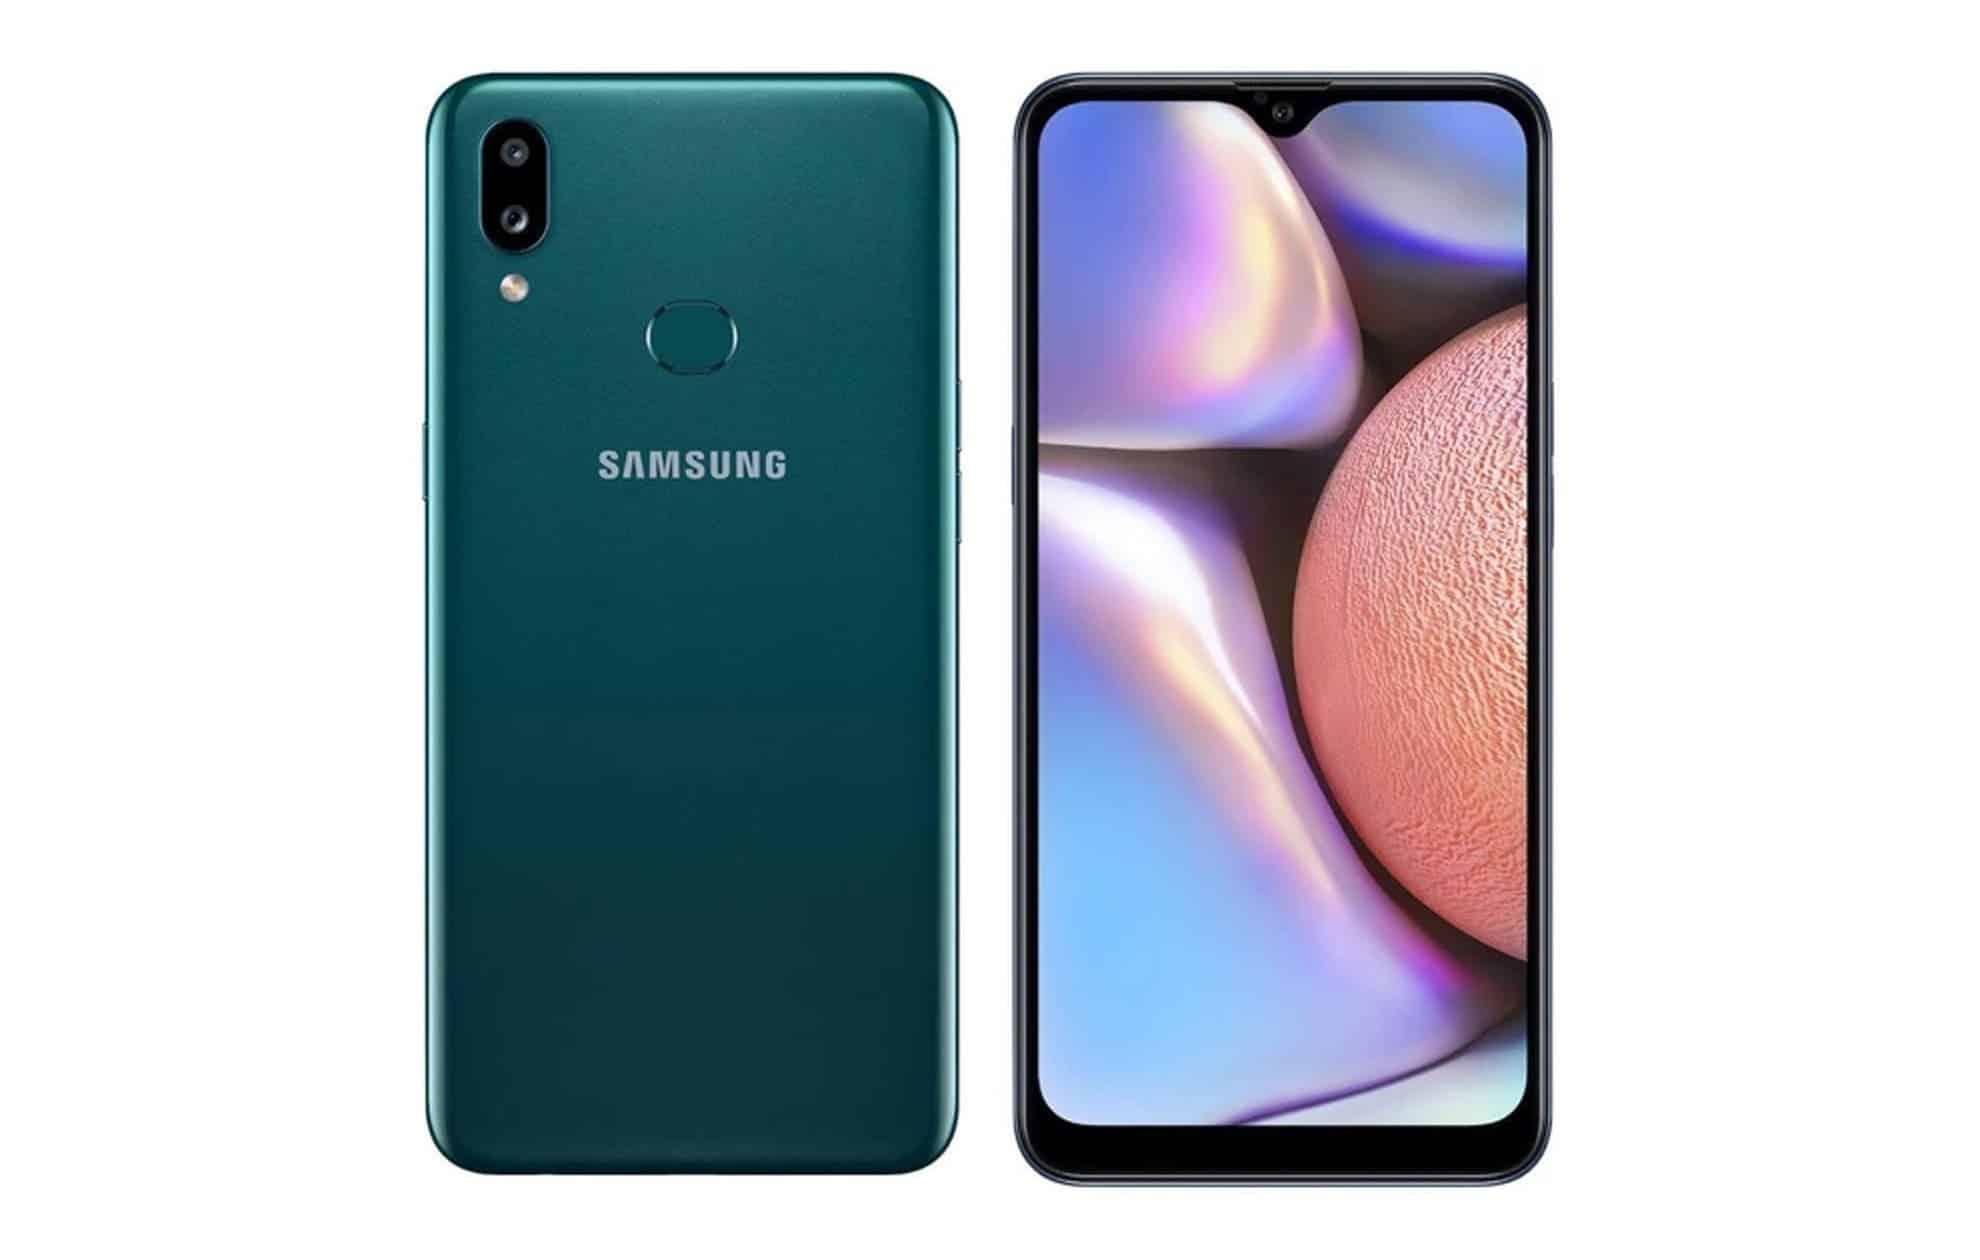 samsungun-yeni-telefonu-galaxy-m01s-duyuruldu